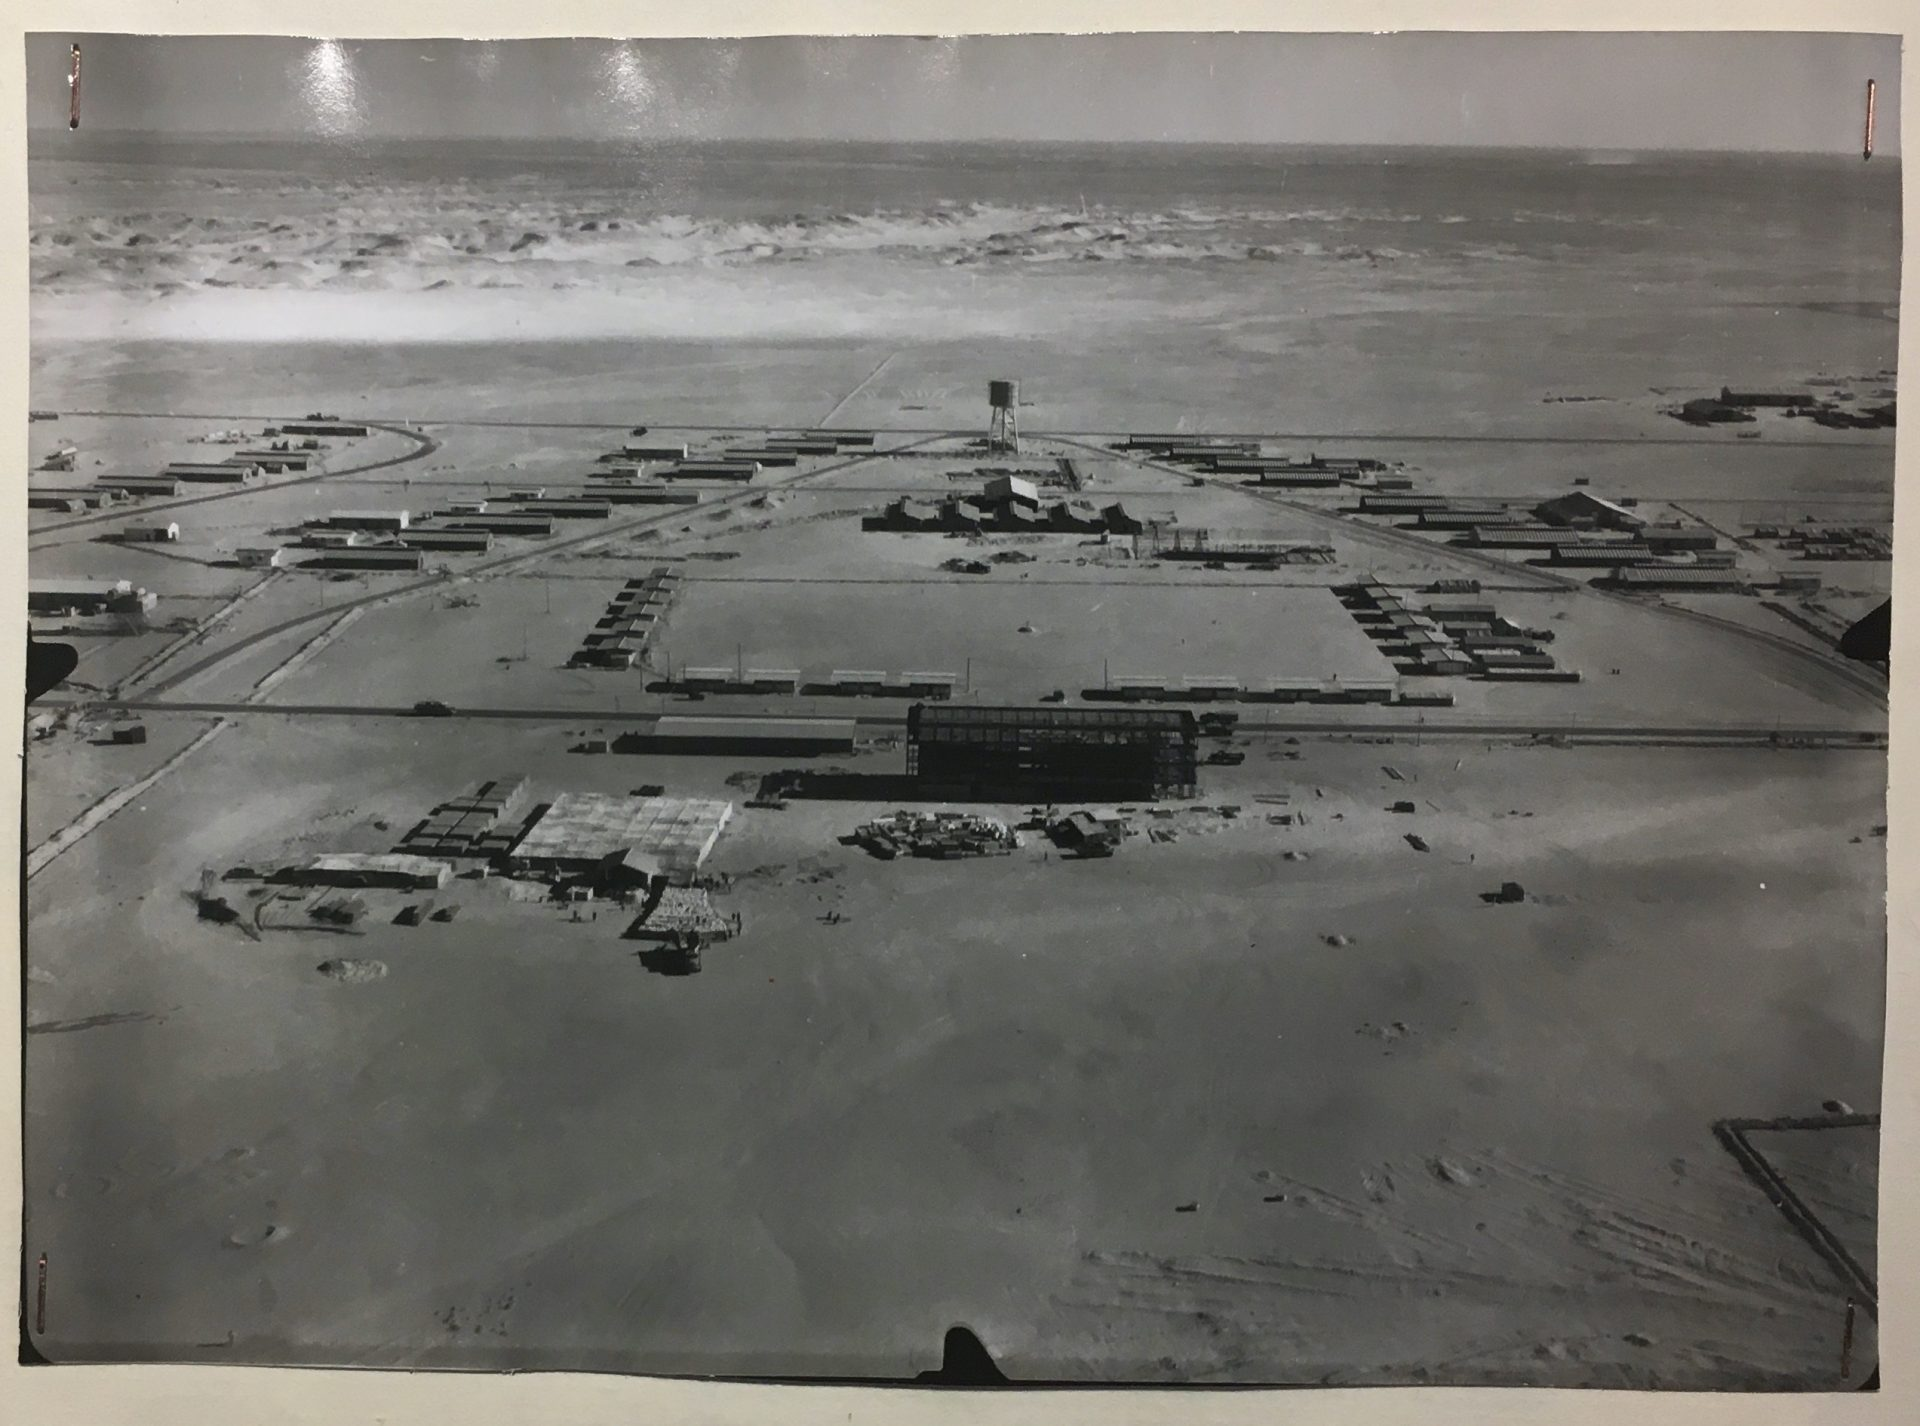 Military base adjacent to France's atmospheric test site near Reggane, Algeria, circa 1959